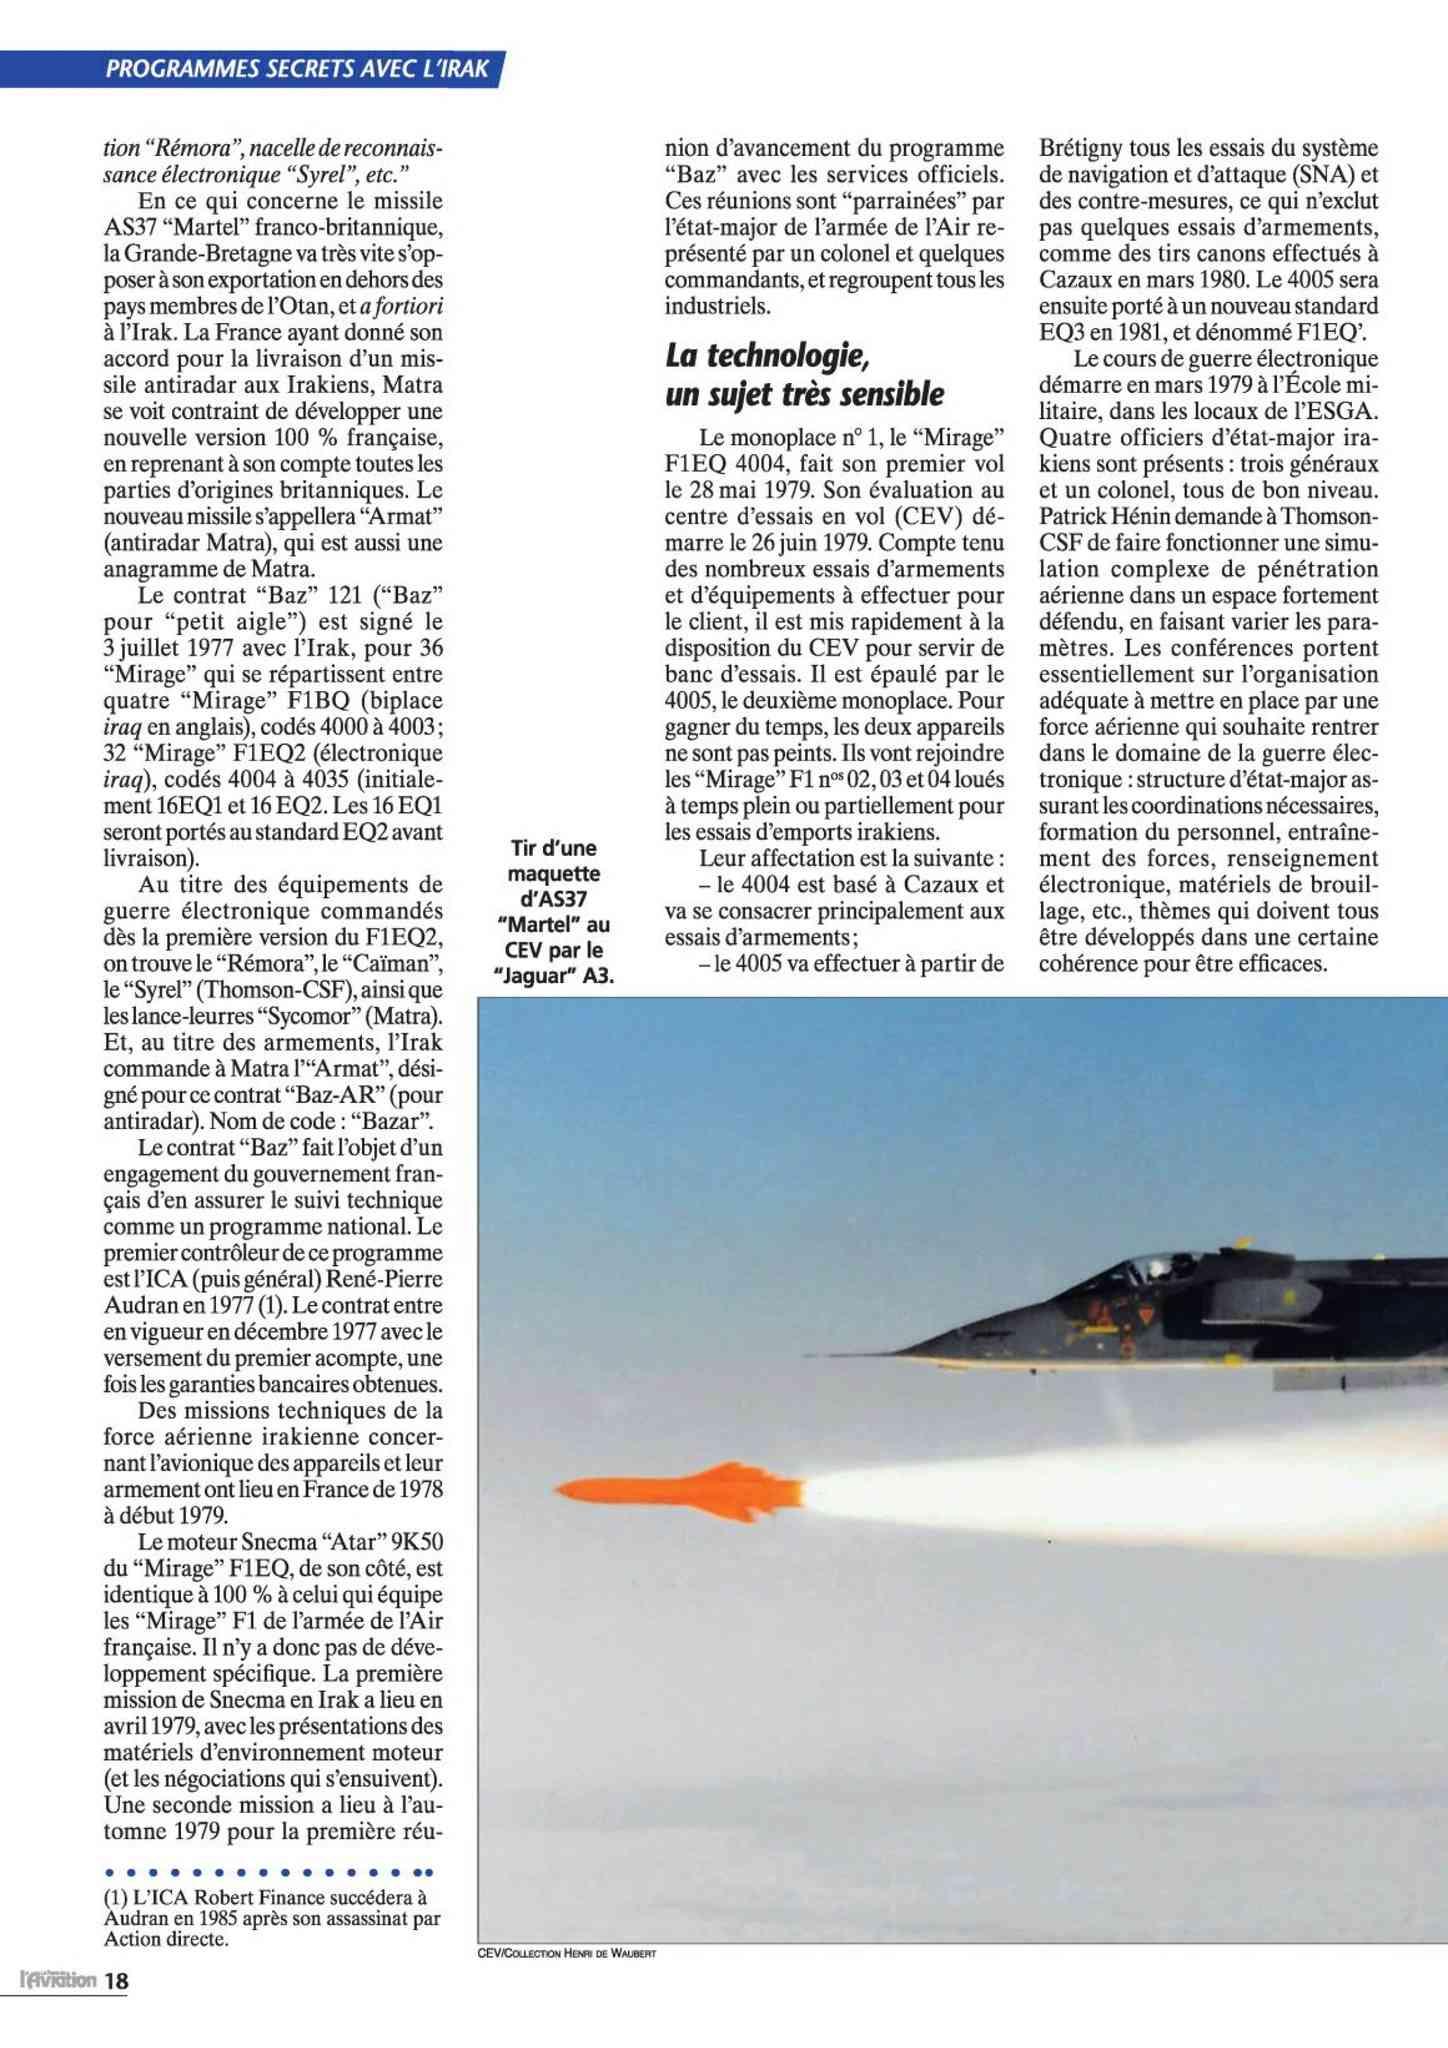 Guerre Iran-Irak - Page 3 A00410